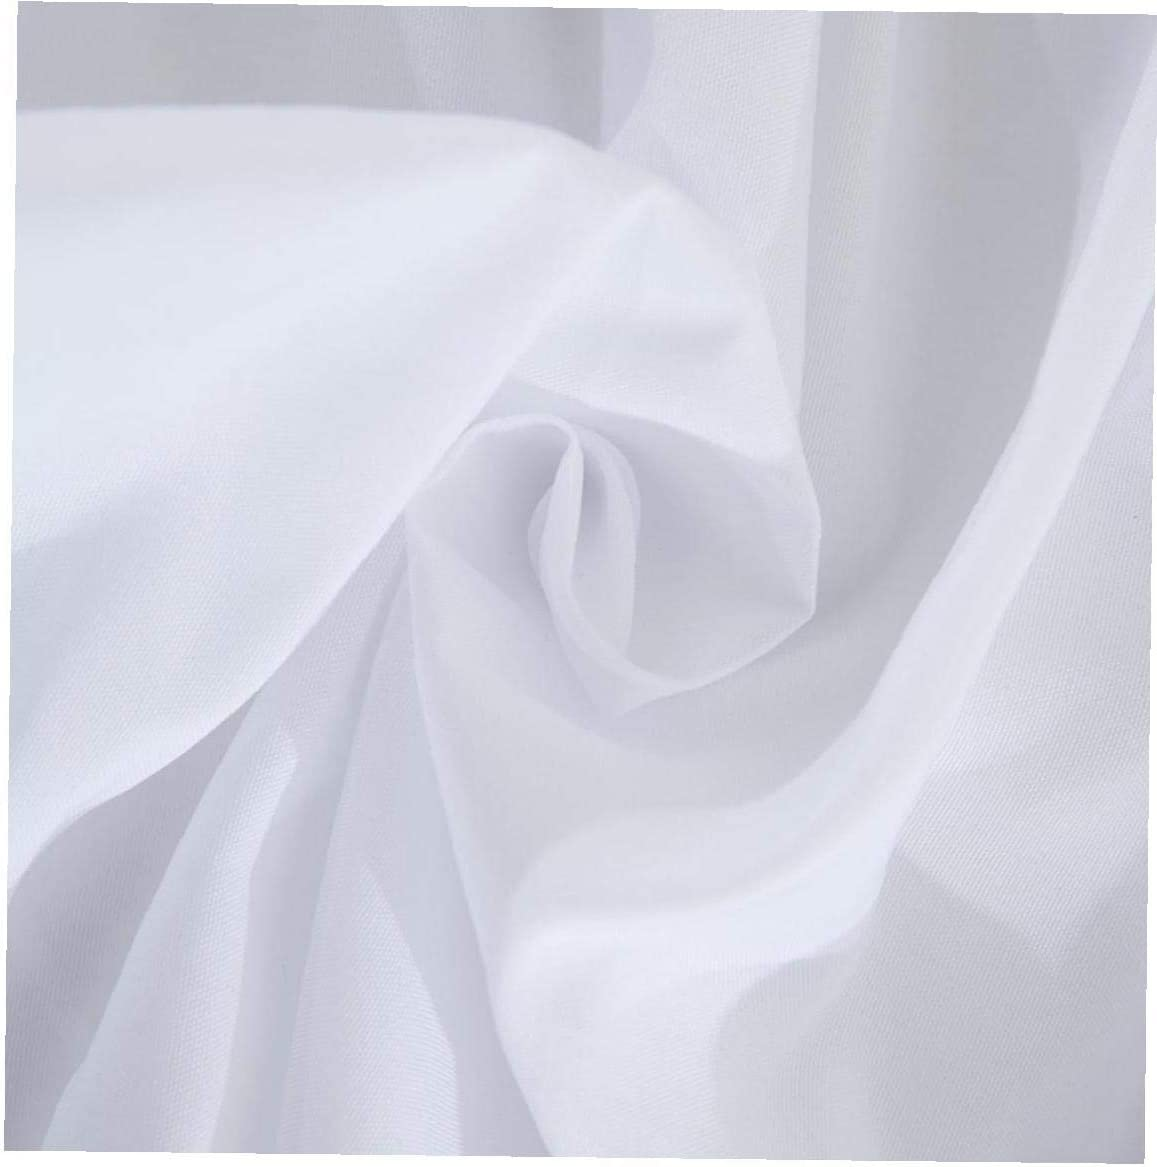 Creativo Wrap Around letto Letto Gonna poliestere elastico anti polvere Ruffle tessuto Sides morbidezza serica Gonna rughe bianco US-Twin Type